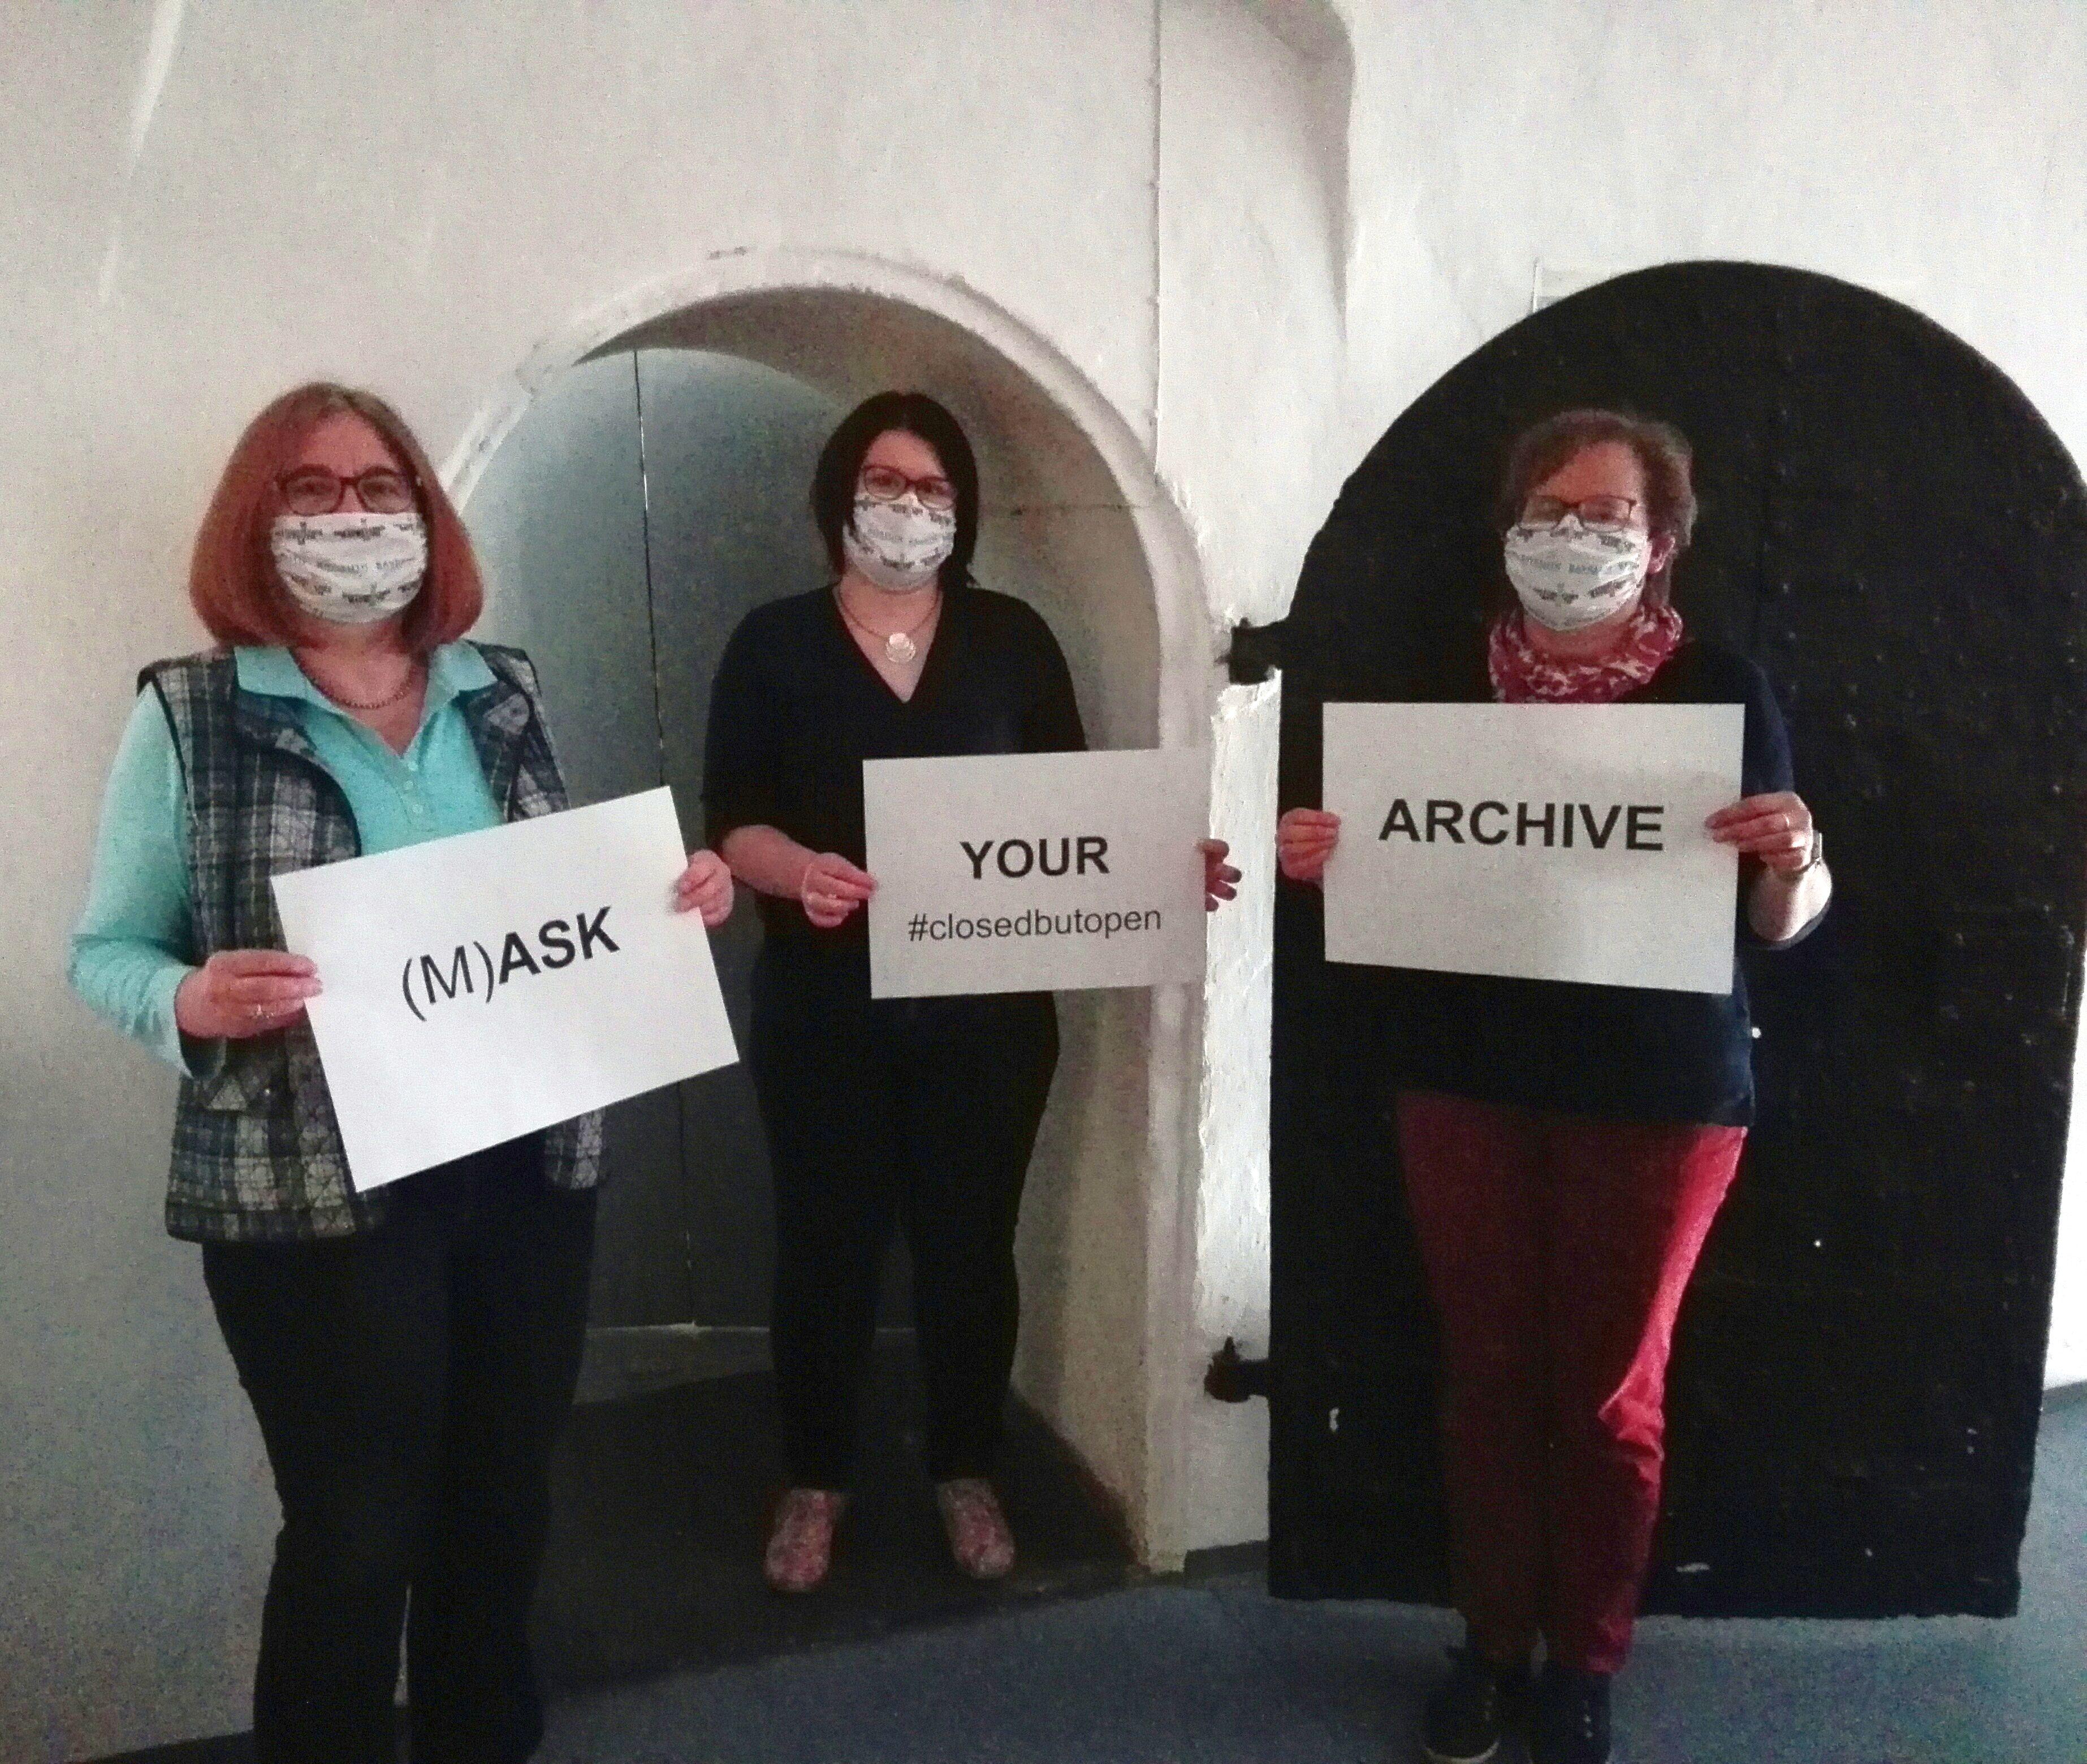 #closedbutopen (M)ASK YOUR ARCHIVE (Mitarbeiterinnen des Stadtarchivs Bayreuth)